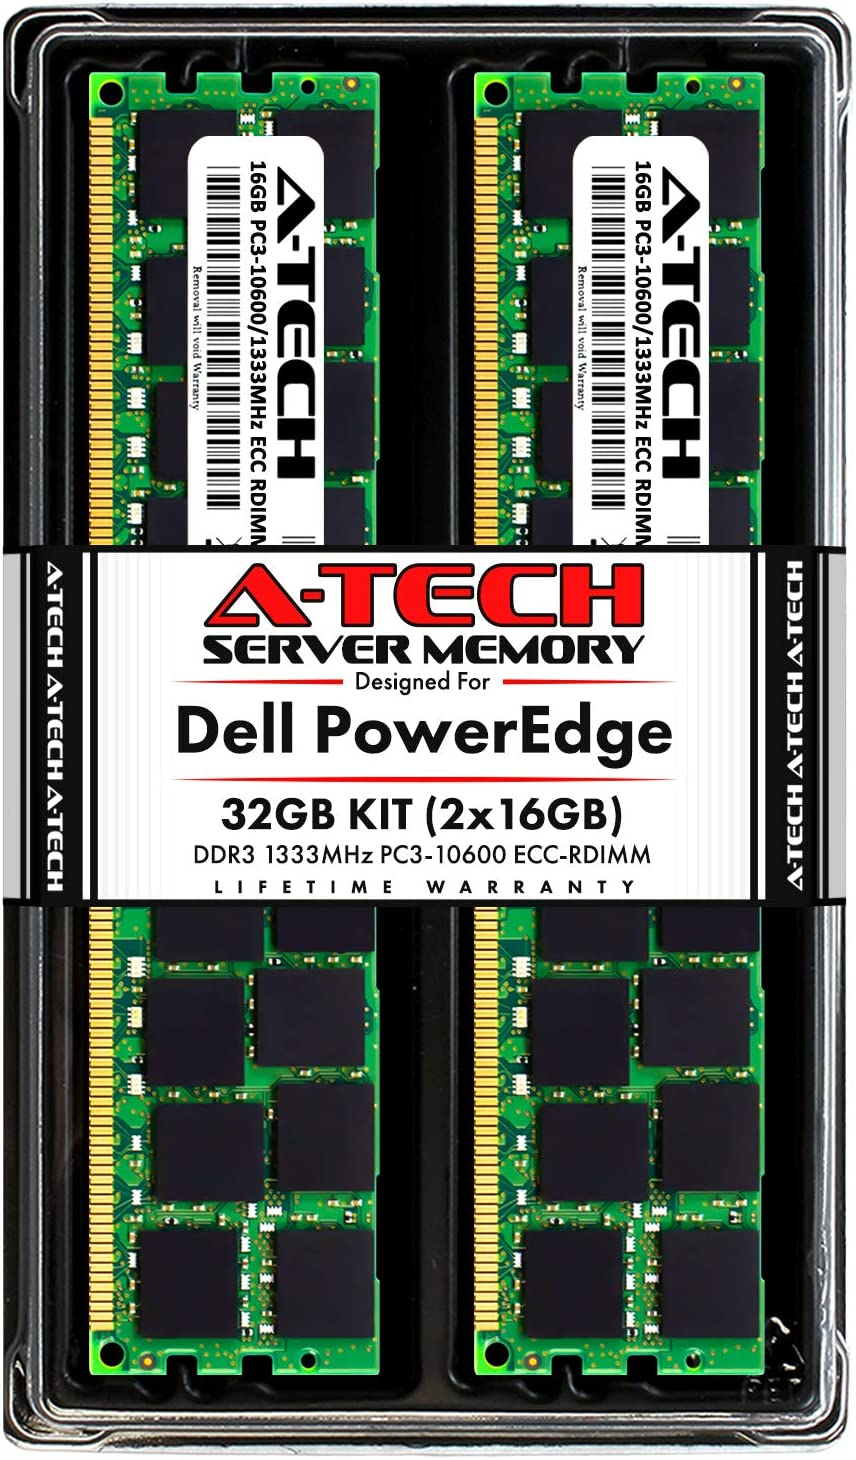 A-Tech 32GB (2x16GB) RAM for Dell PowerEdge R410, R415, R510, R515, R610, R710, R715, R810, R815, R910 | DDR3 1333MHz ECC-RDIMM PC3-10600 2Rx4 1.5V ECC Registered DIMM Server Memory Upgrade Kit